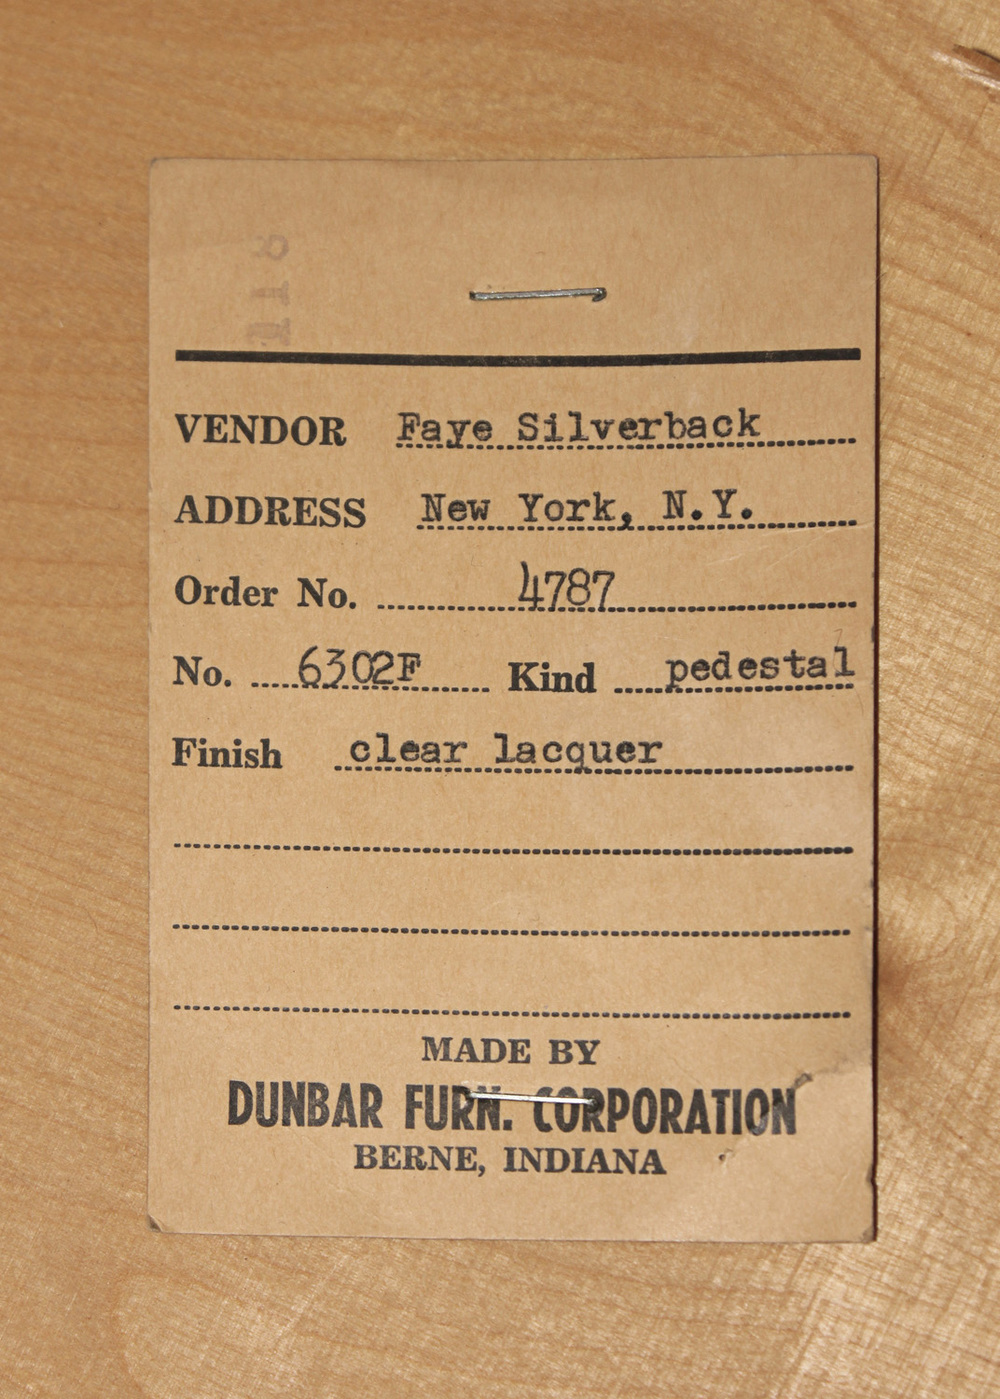 Dunbar 85 olive burl pedestal+gls coffeetable375 detail7 hires.jpg